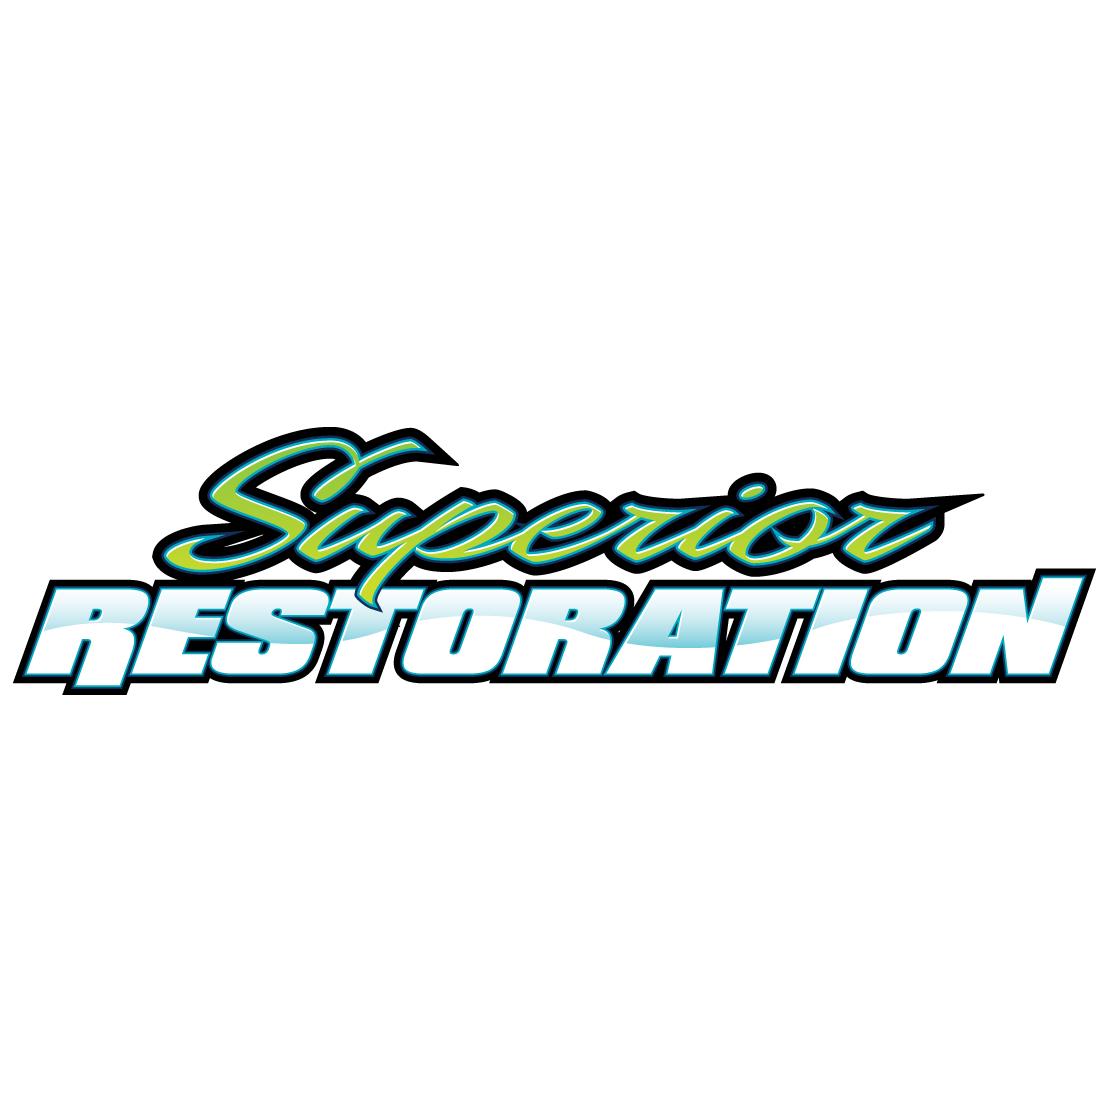 Superior Restoration - Temecula, CA - Water & Fire Damage Restoration